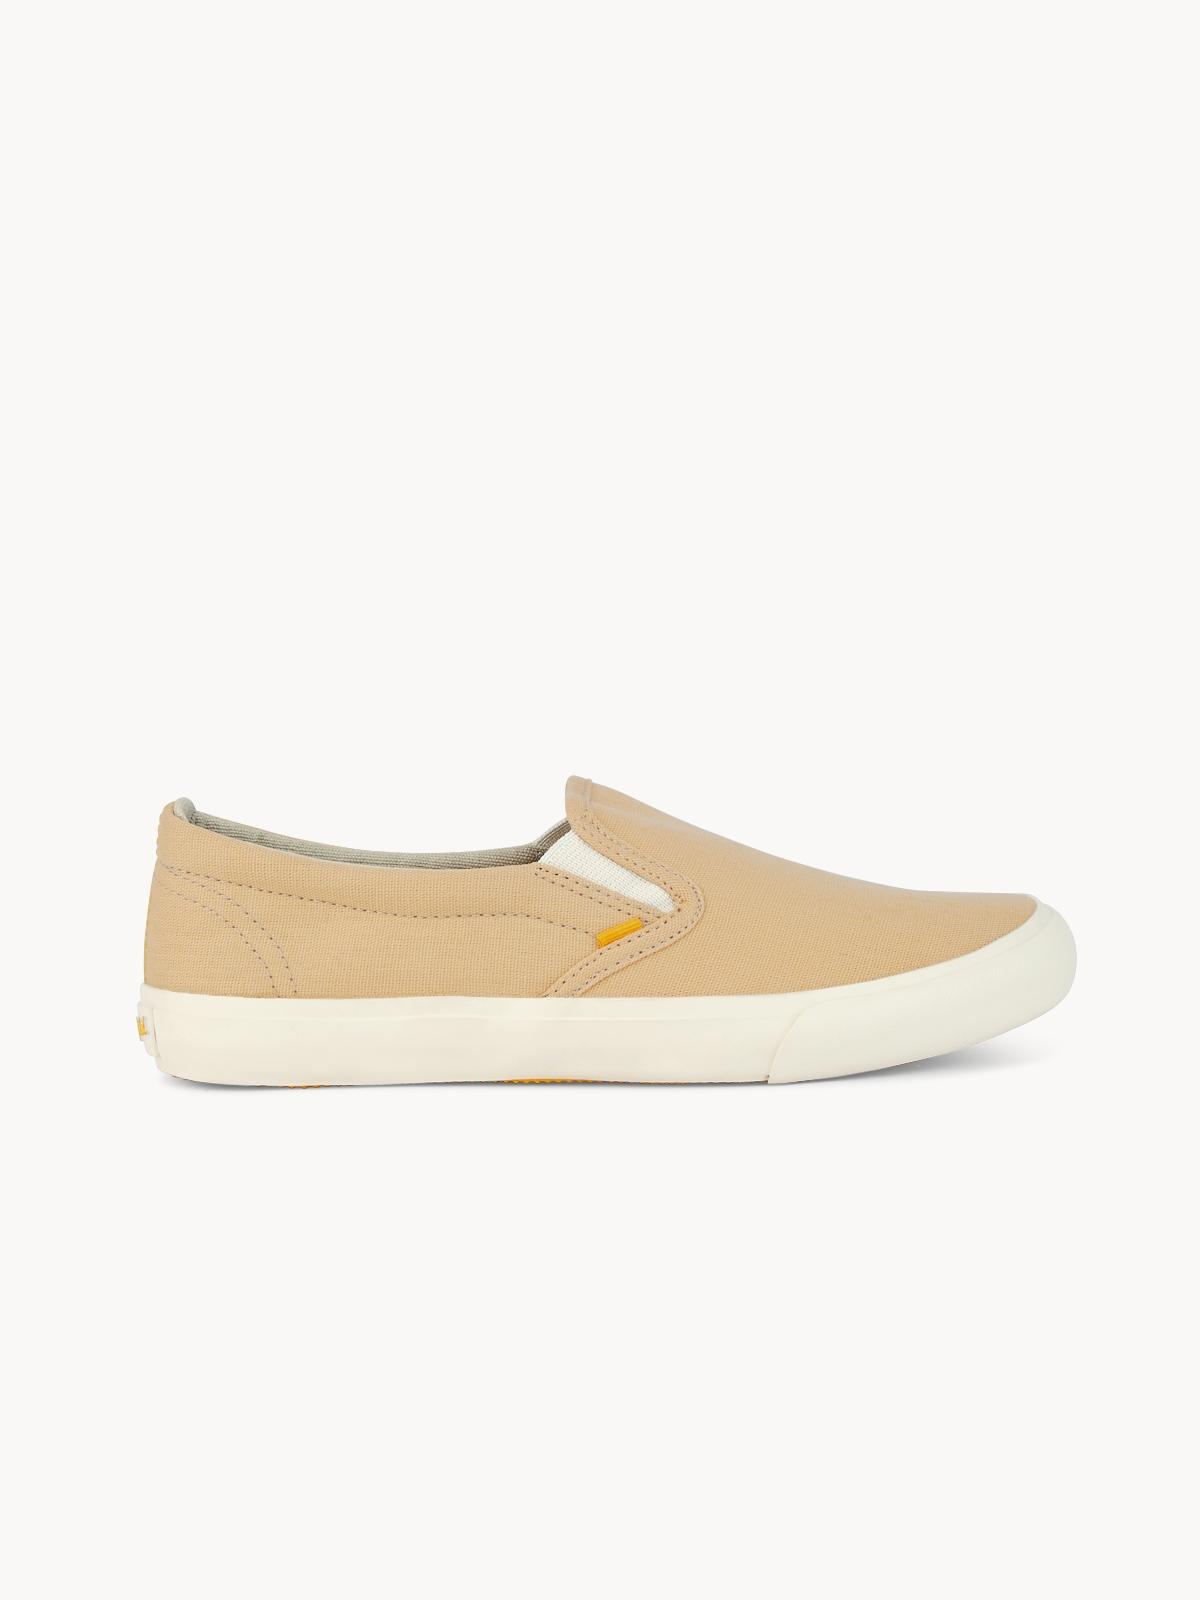 Mustard Slip On Sneakers Honey